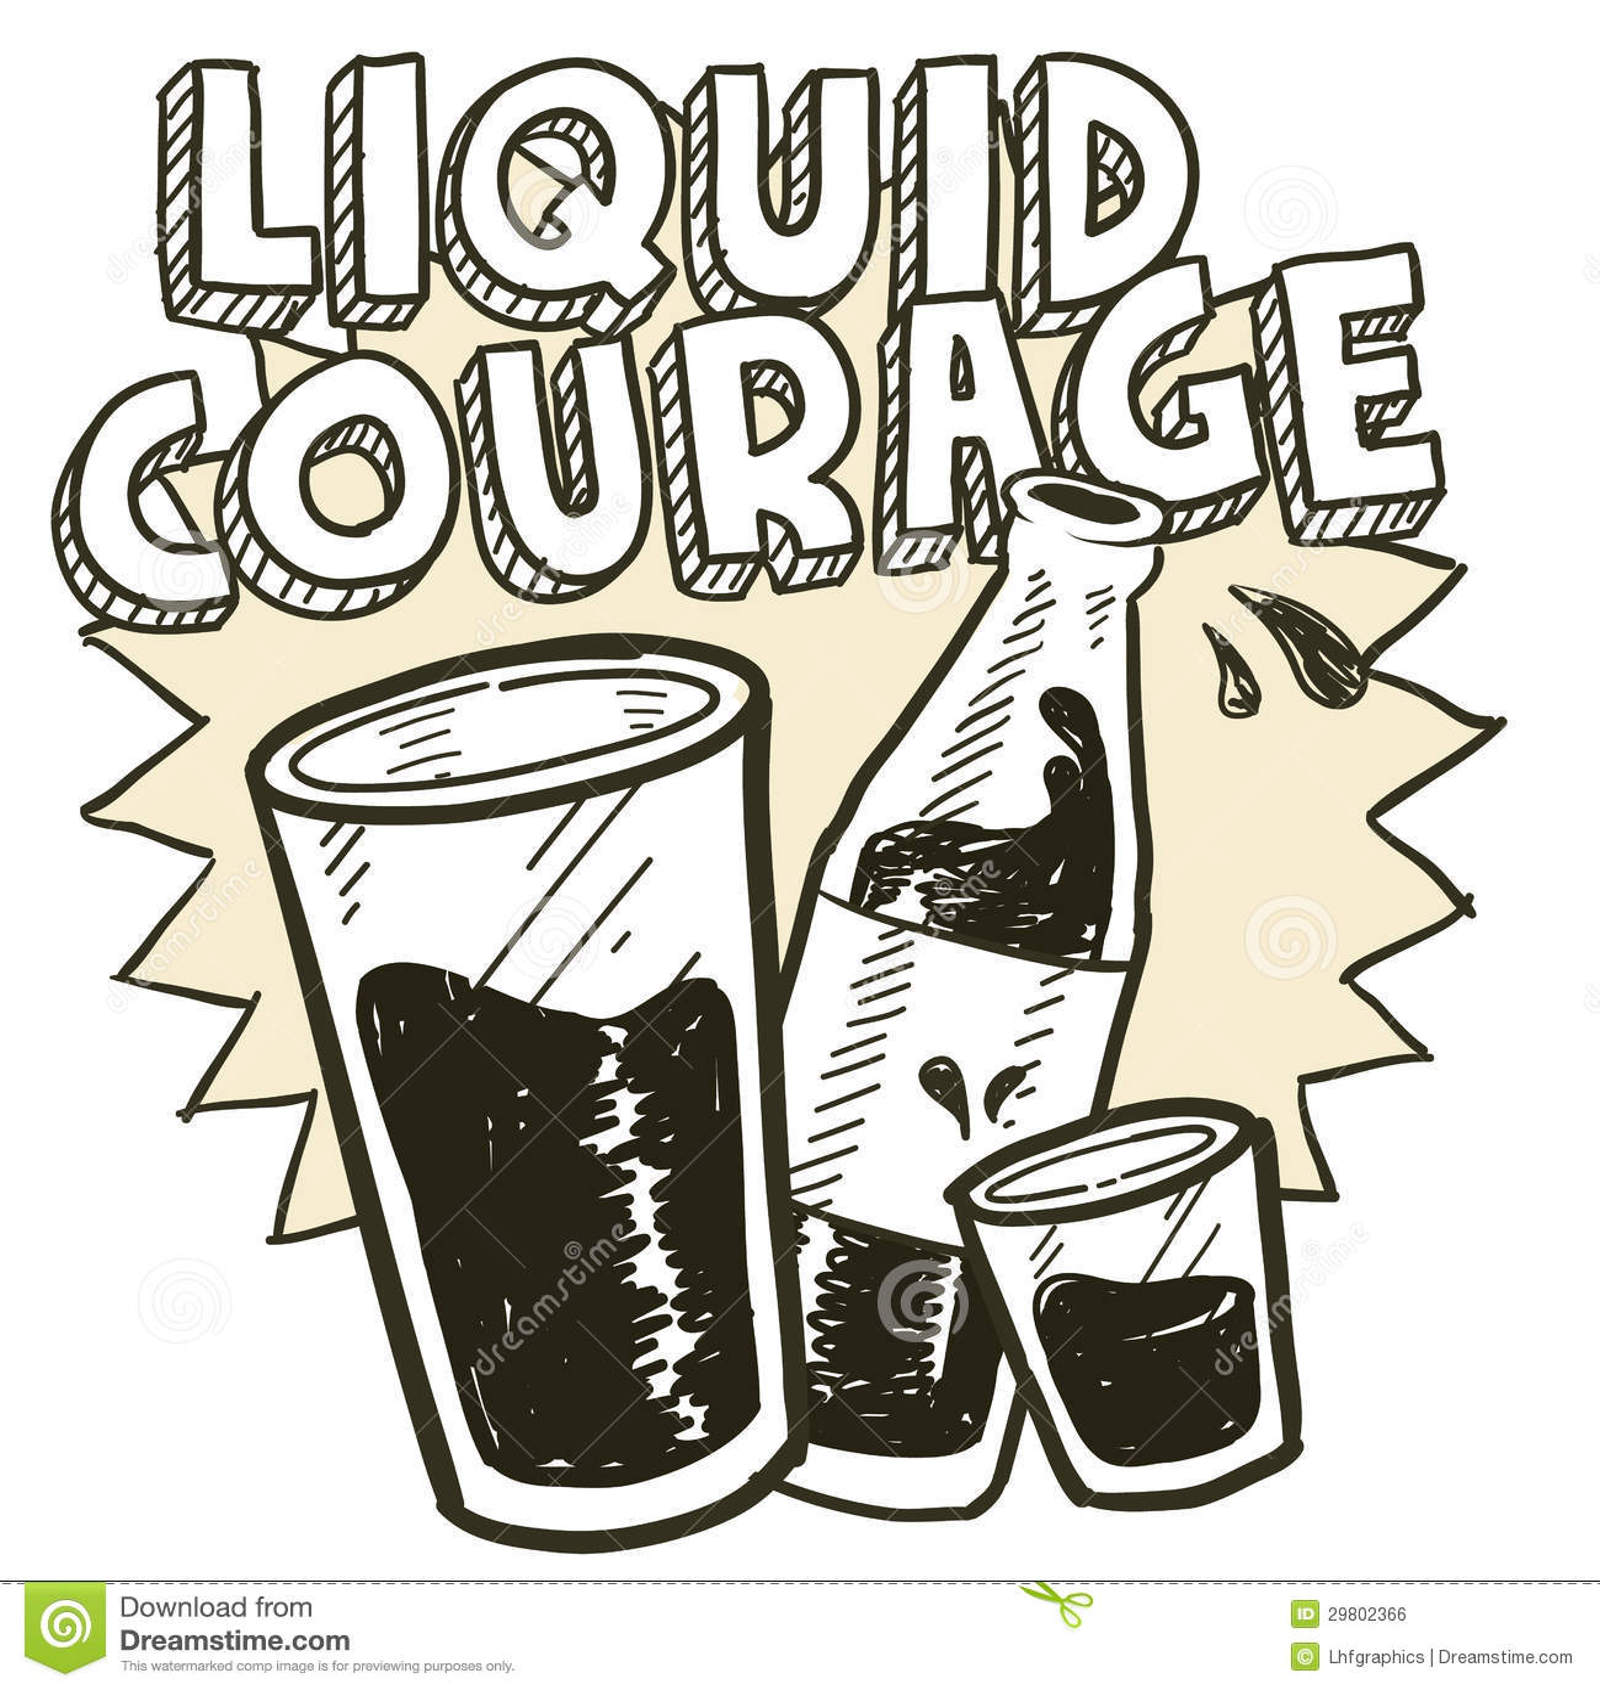 wallpaper beers vector alcohol funny cartoonish bears drinks